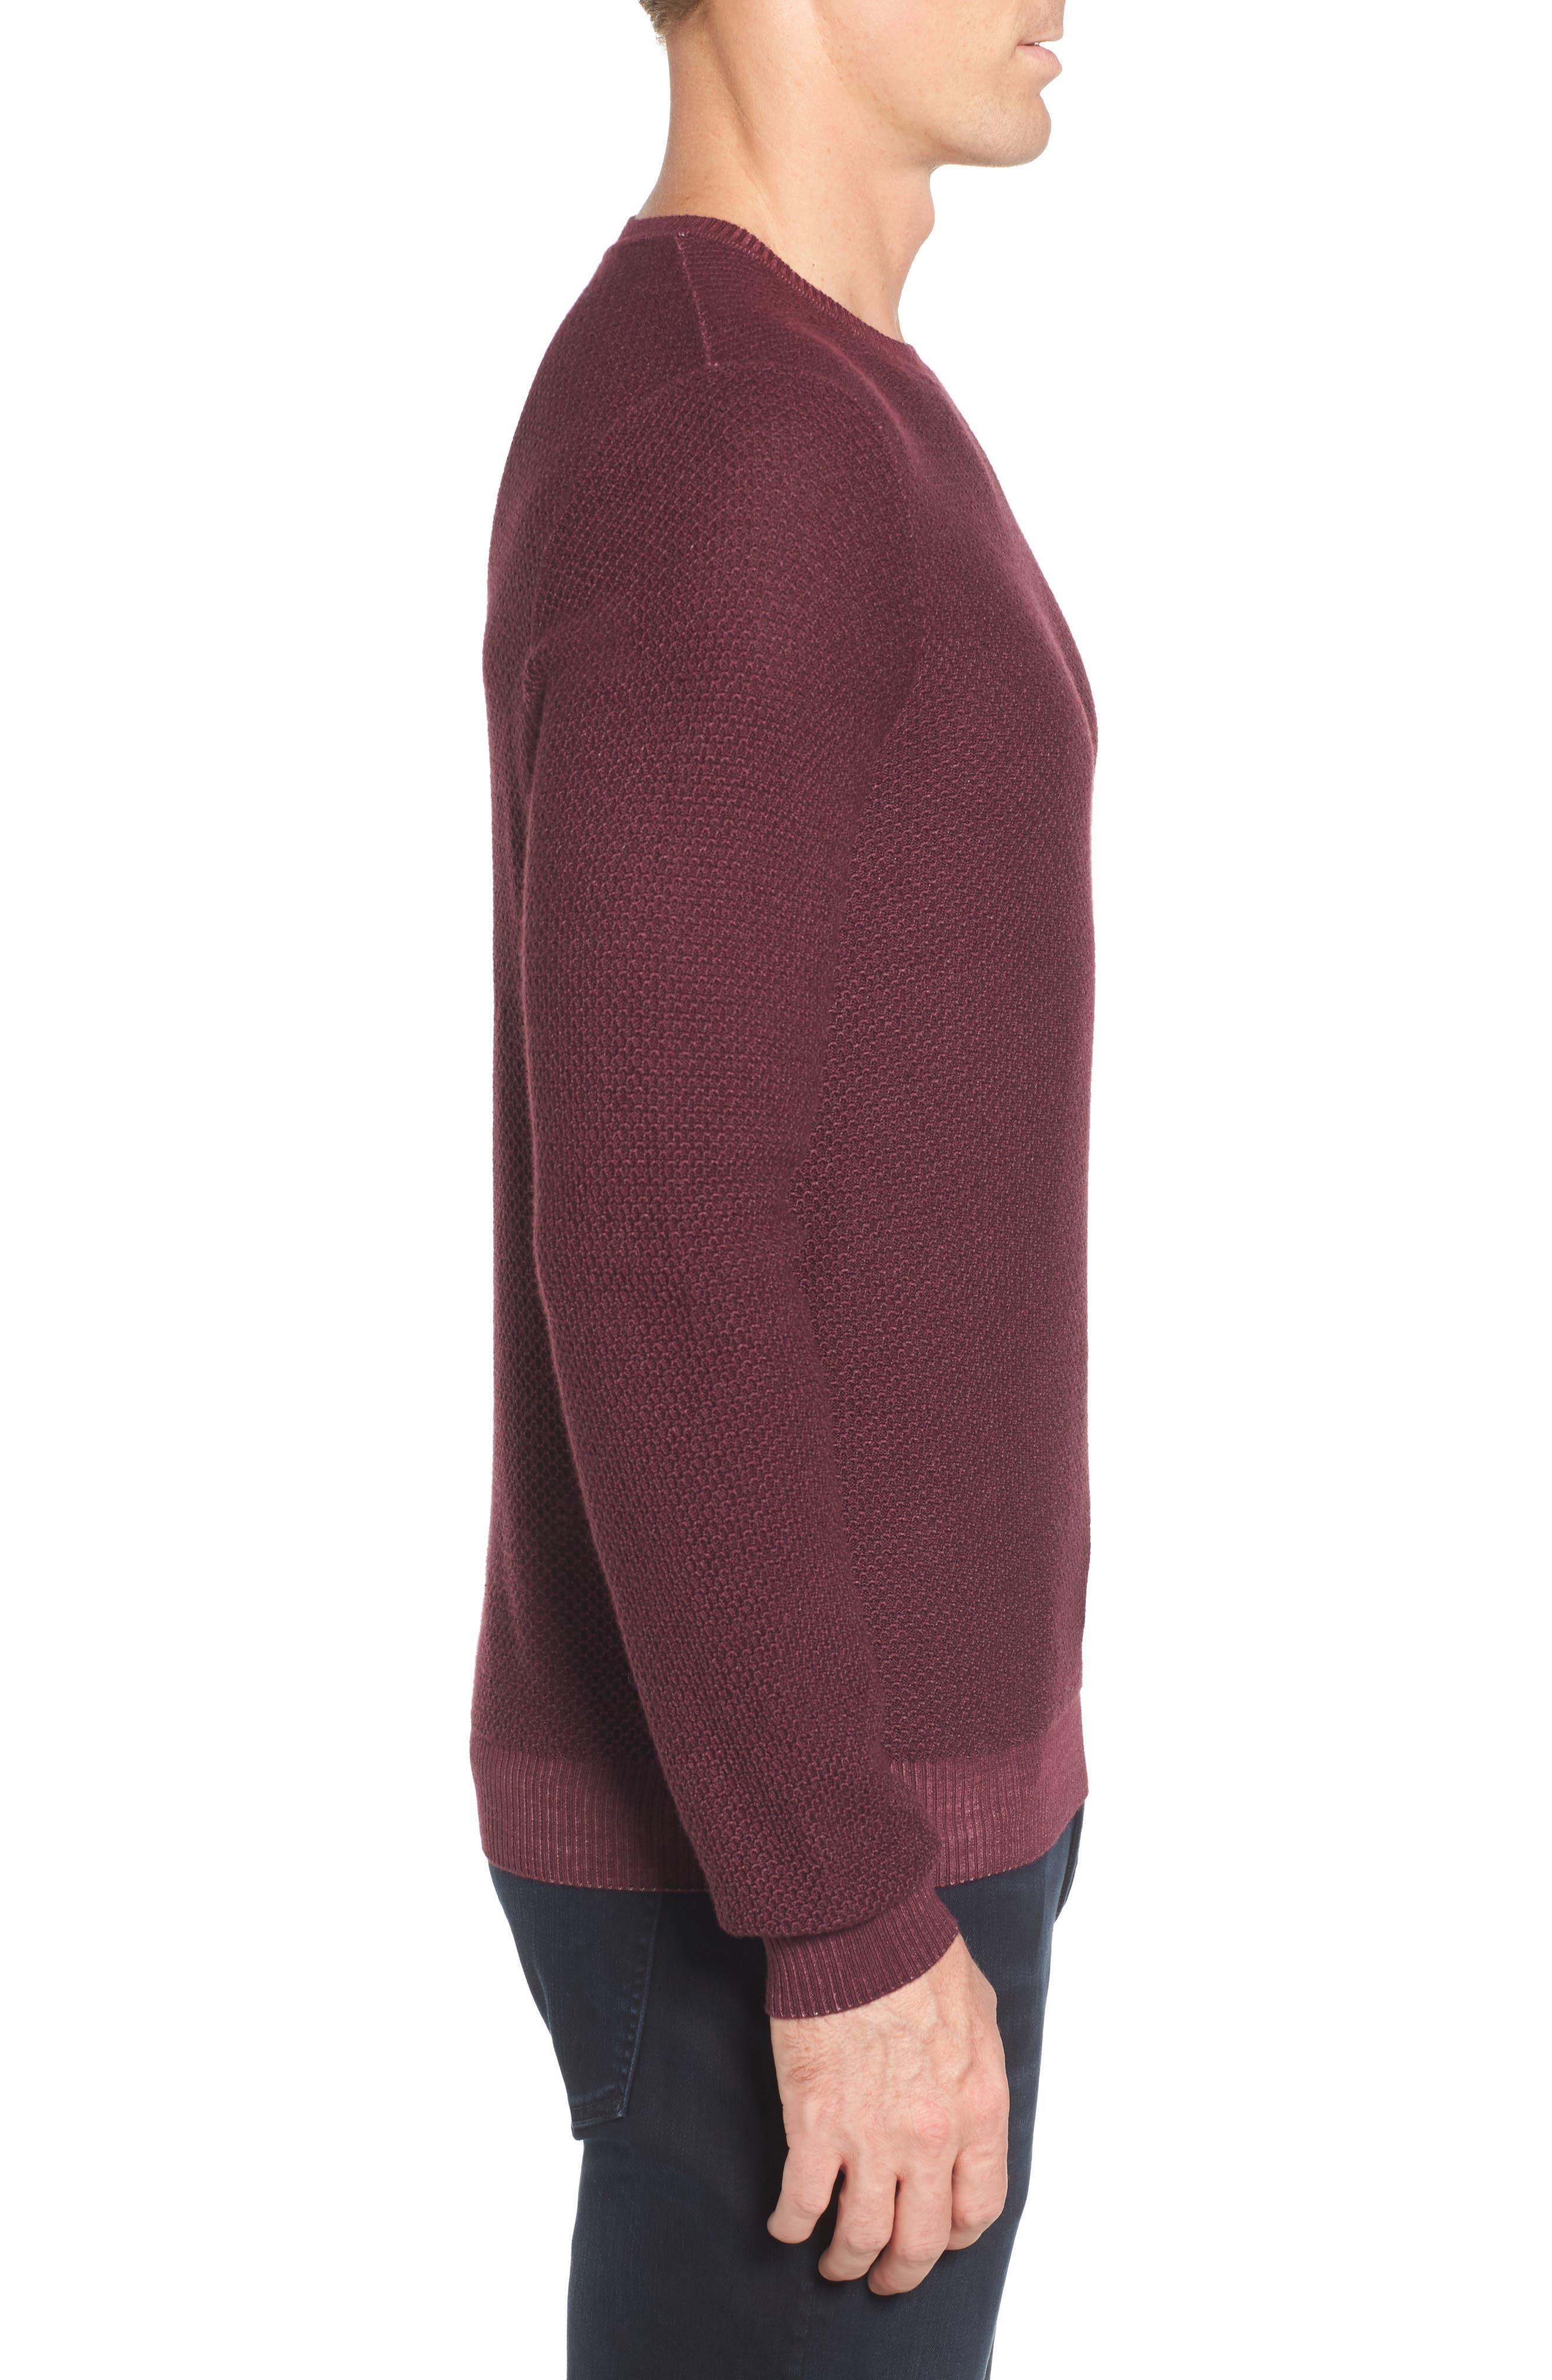 Honeycomb Merino Crewneck Sweater,                             Alternate thumbnail 3, color,                             Burgundy